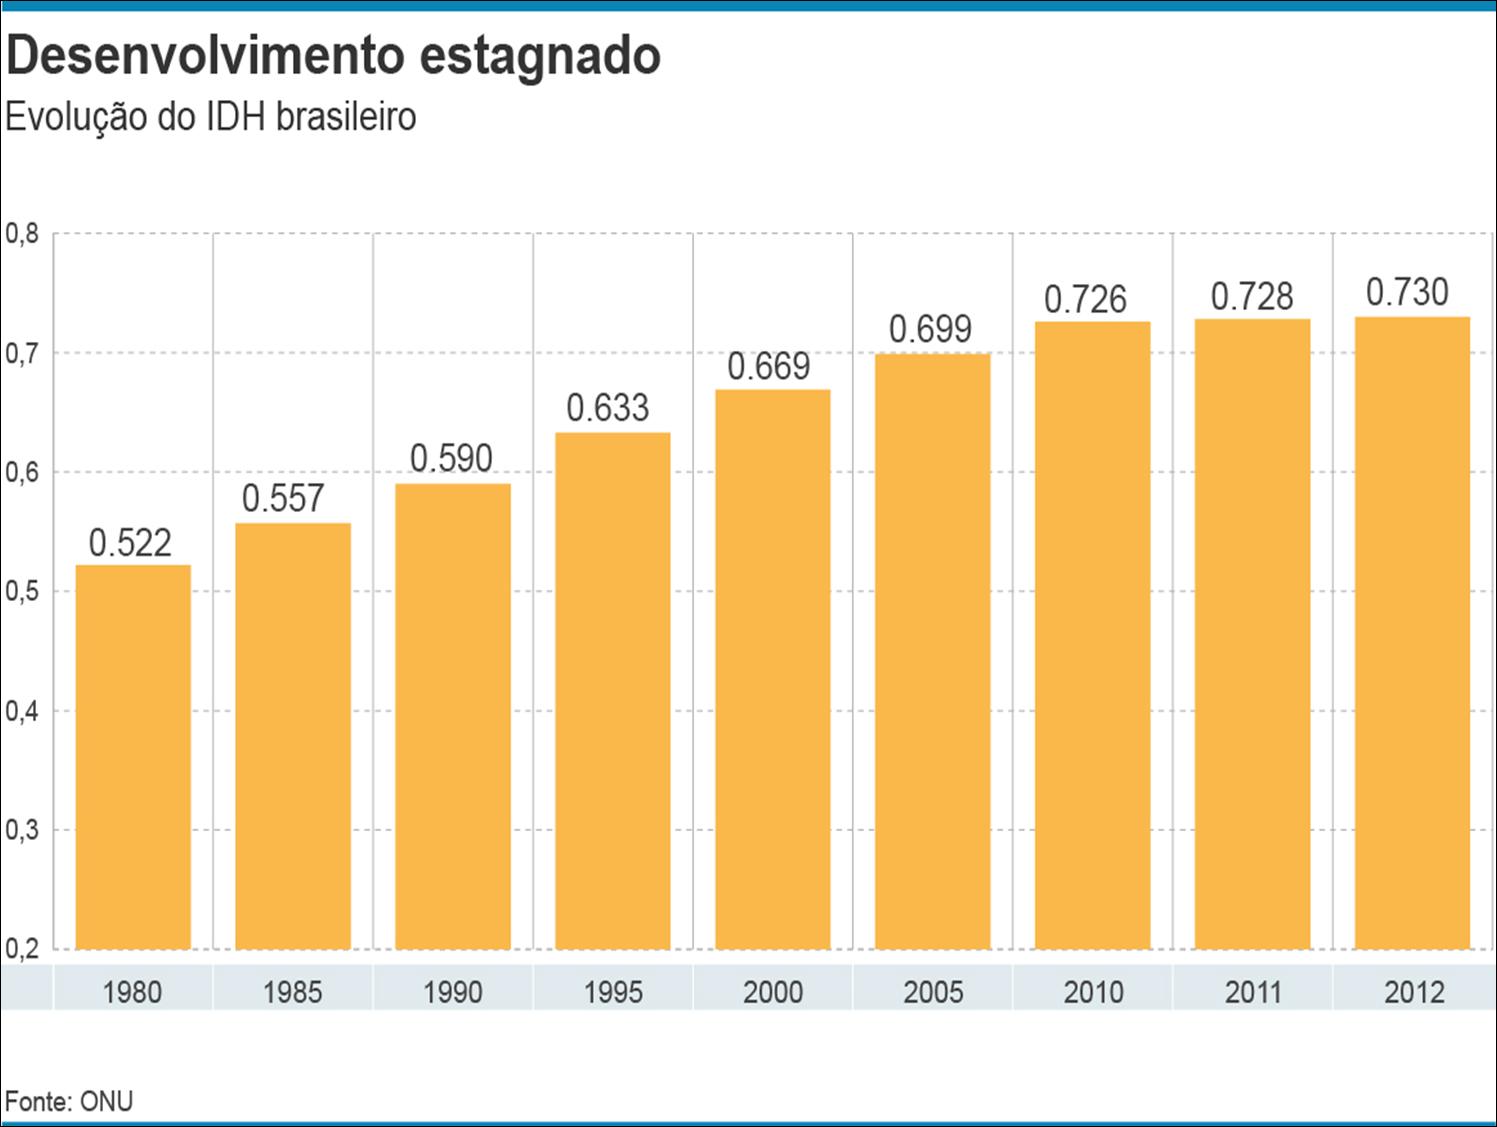 [Imagem: evolu%C3%A7%C3%A3o+idh+brasil.png]